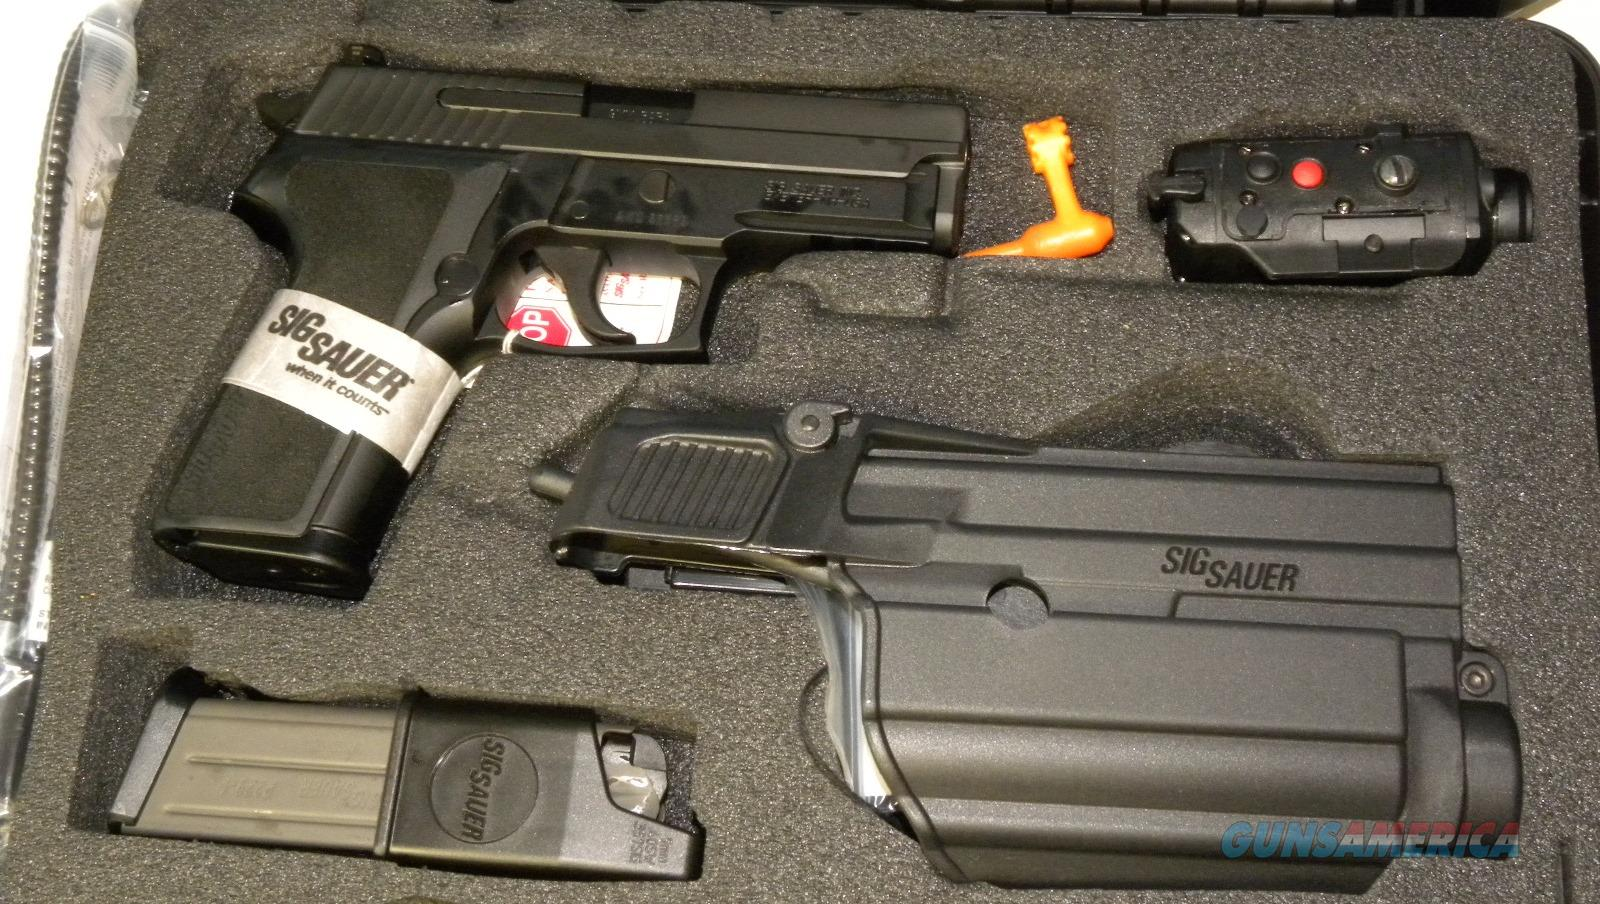 Sig Sauer 229R-9-BSS-TACPAC w/ Laser  Guns > Pistols > Sig - Sauer/Sigarms Pistols > P229